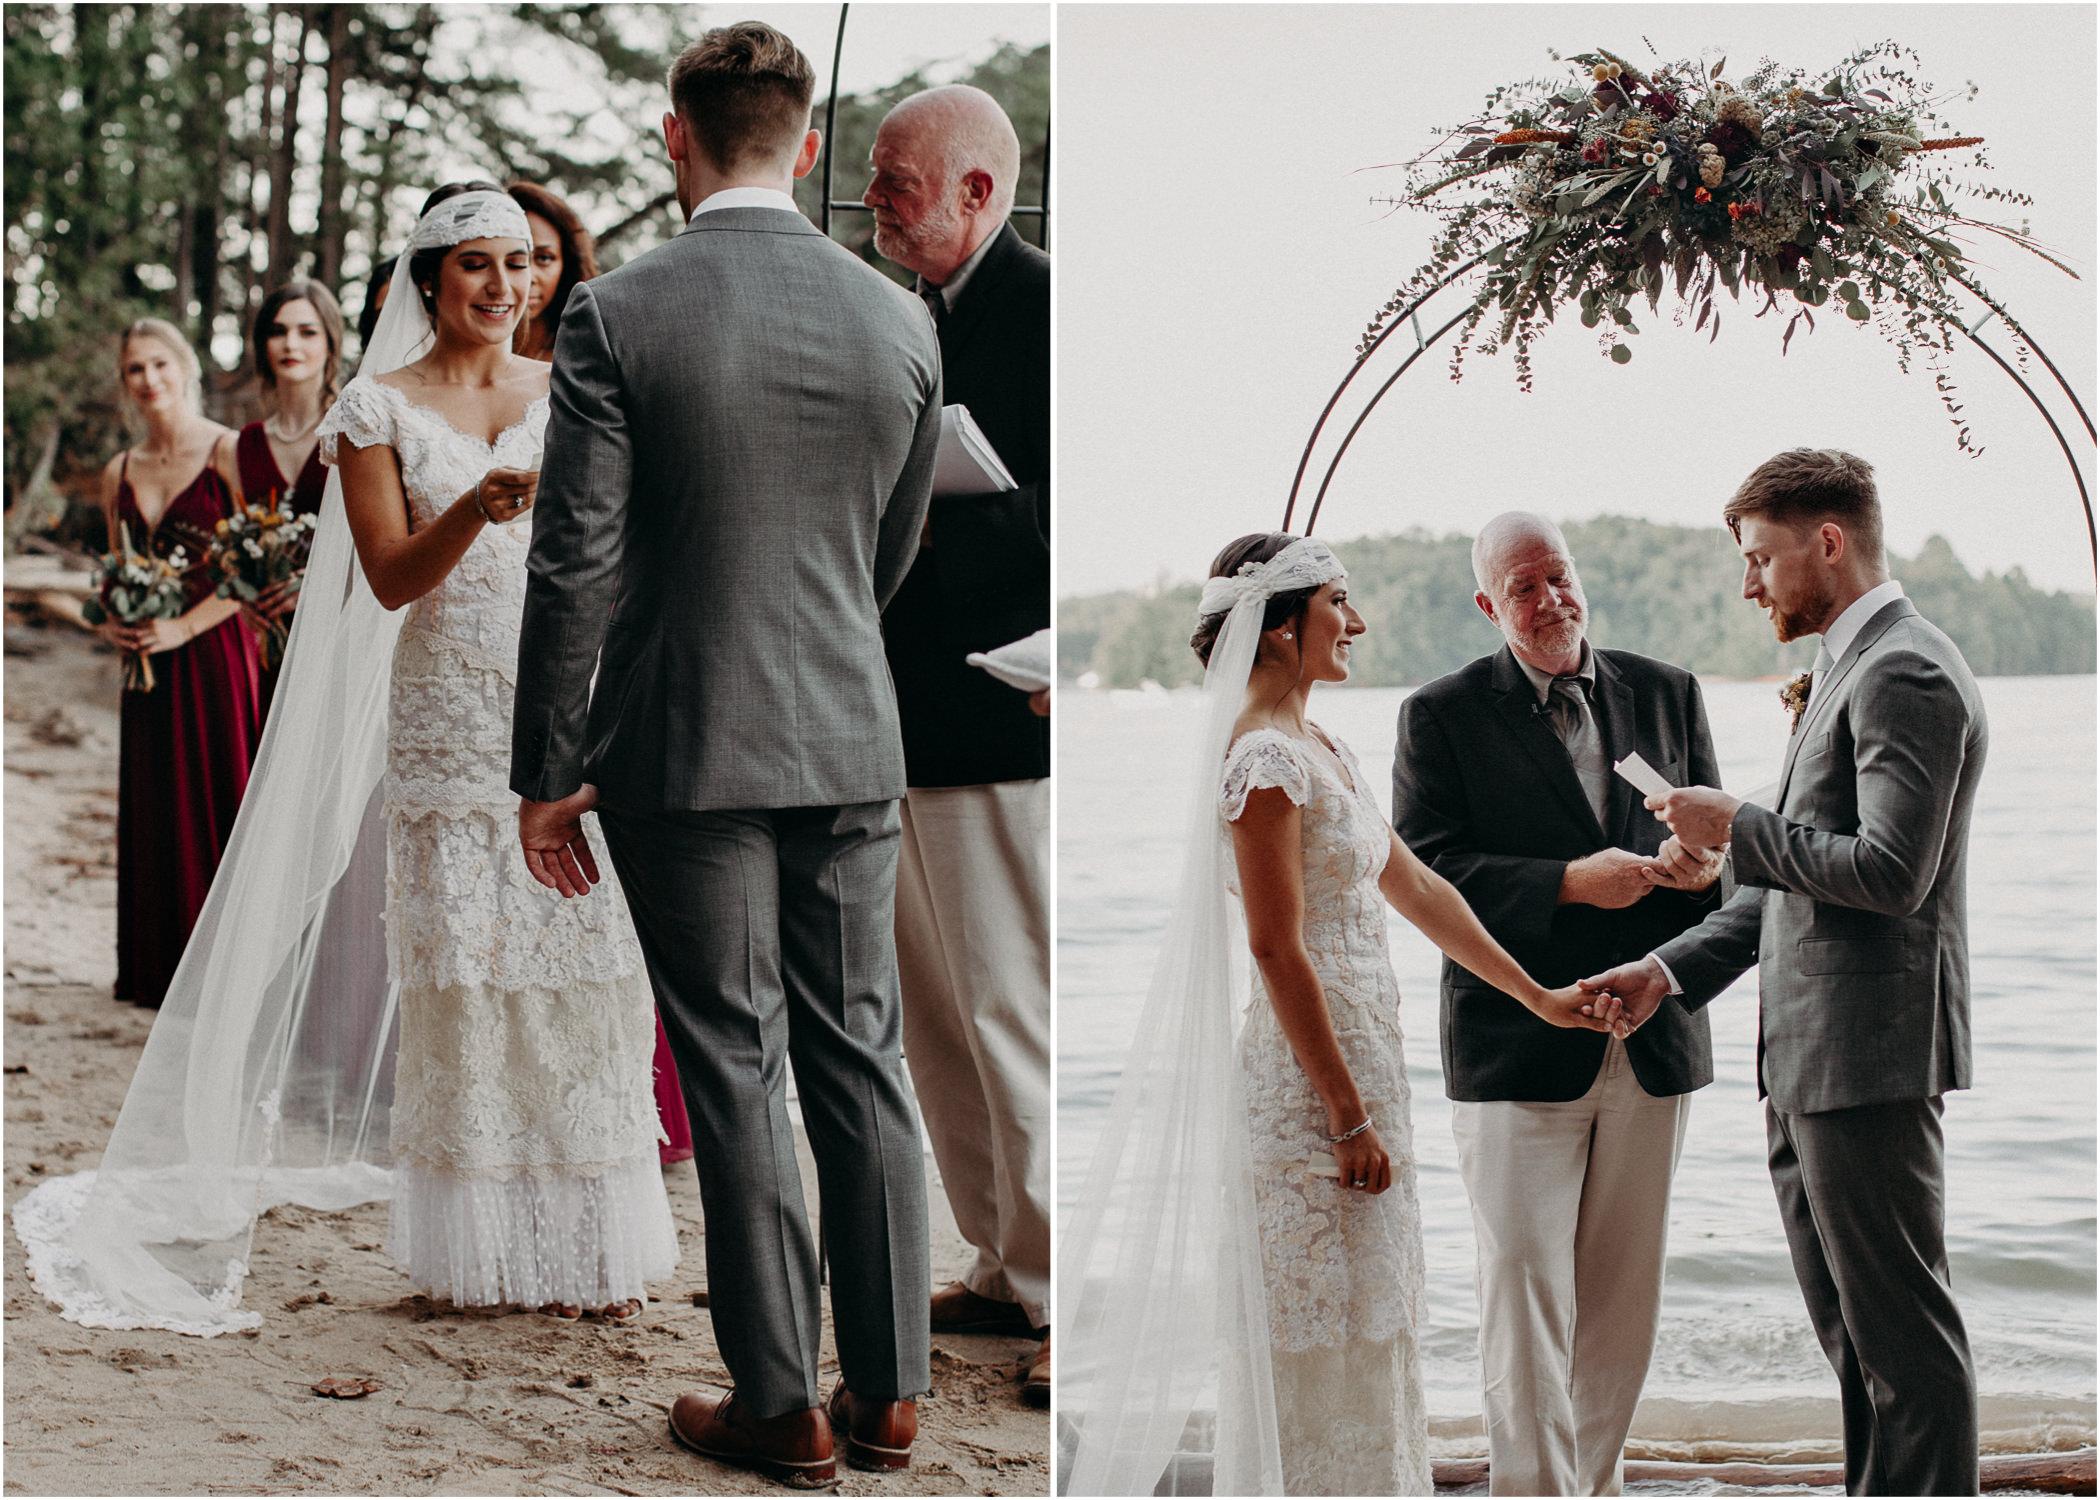 100 - Bride walking down the aisle -  Wedding Ceremony - Destination Wedding : Beach : Lake Wedding Atlanta Wedding Photographer .jpg